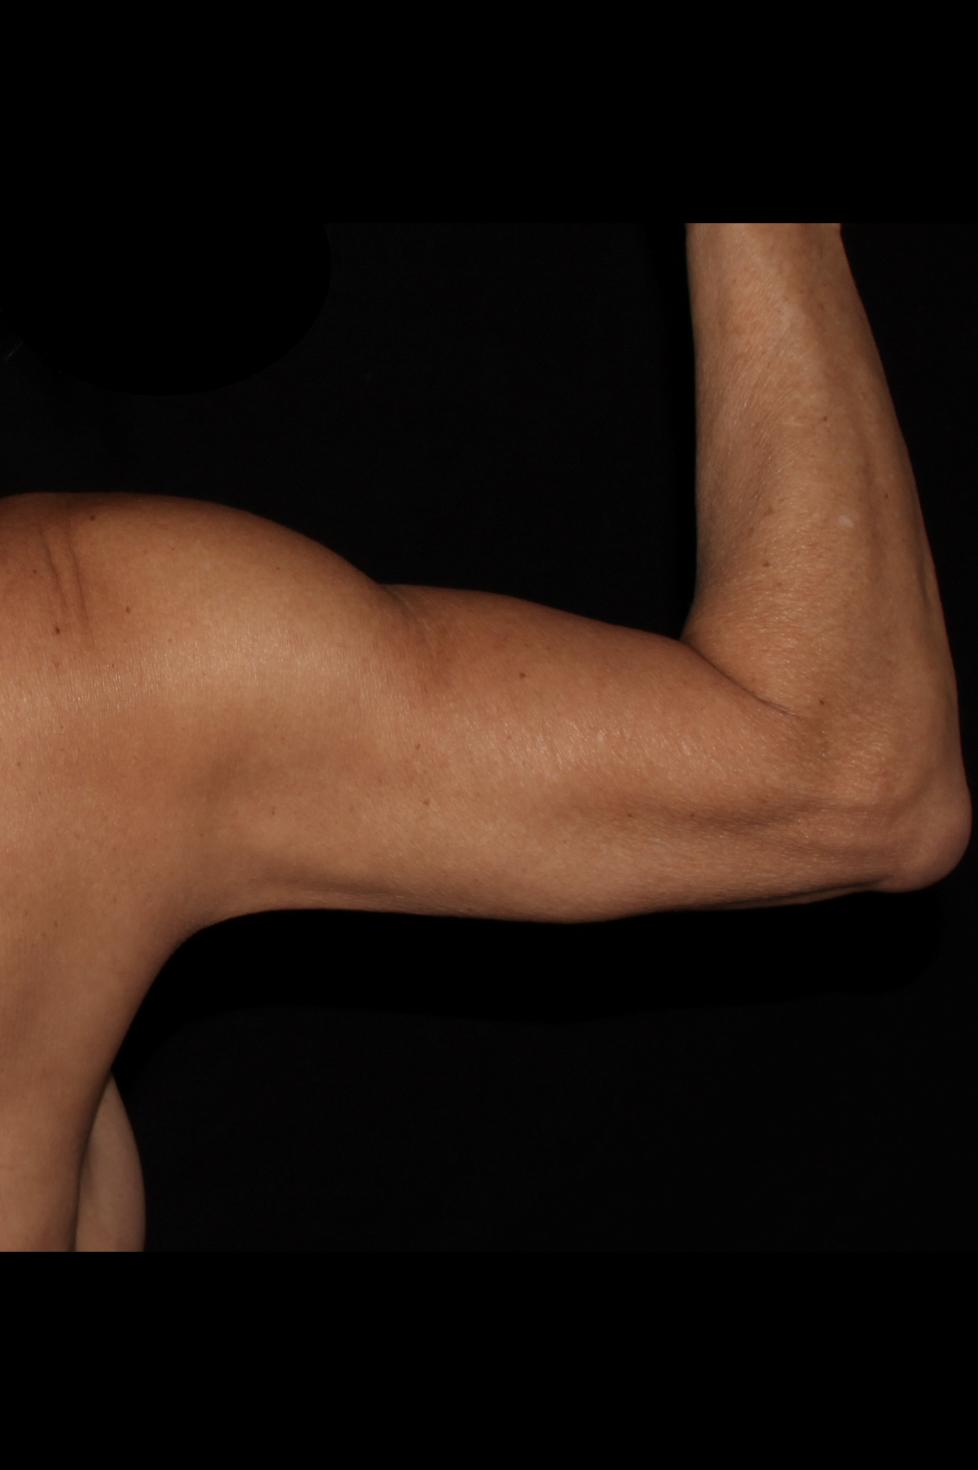 After Arm Procedure - Arm Liposuction & Skin Tightening